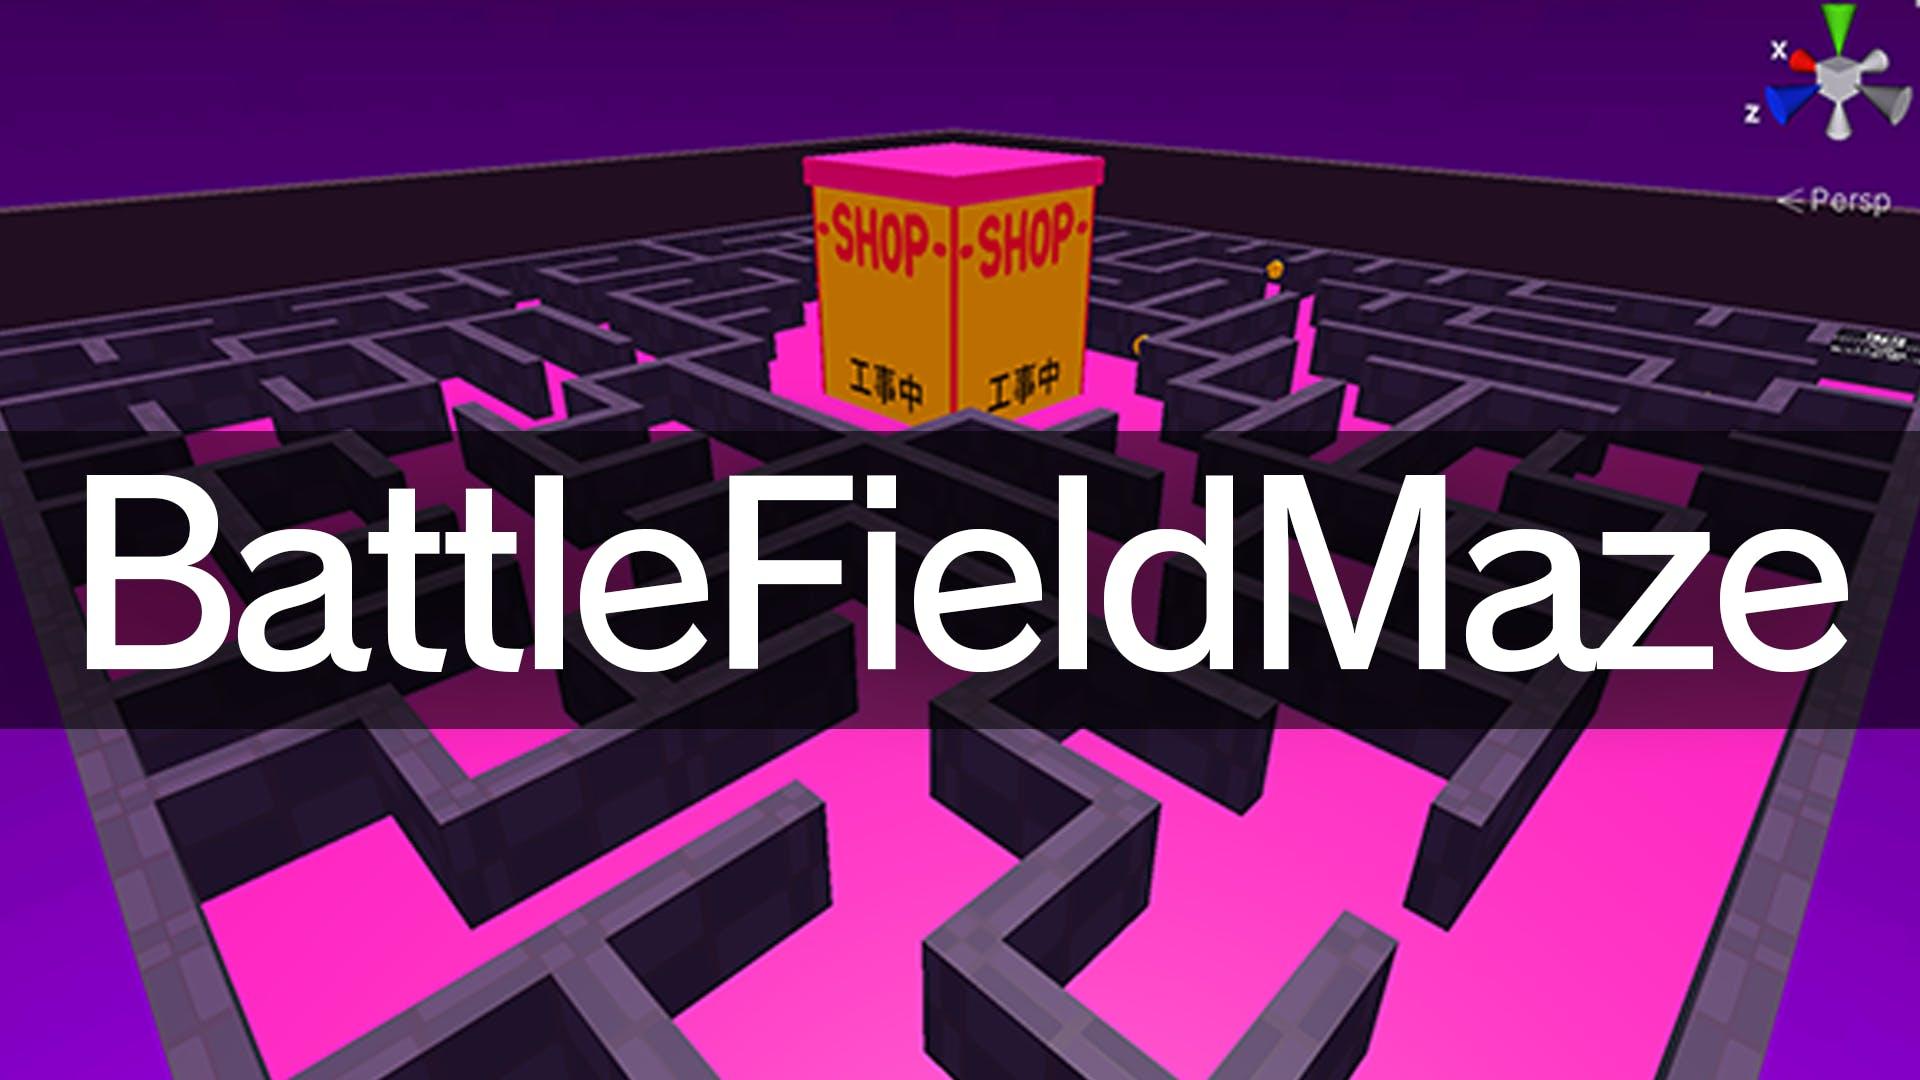 BattleFieldMaze